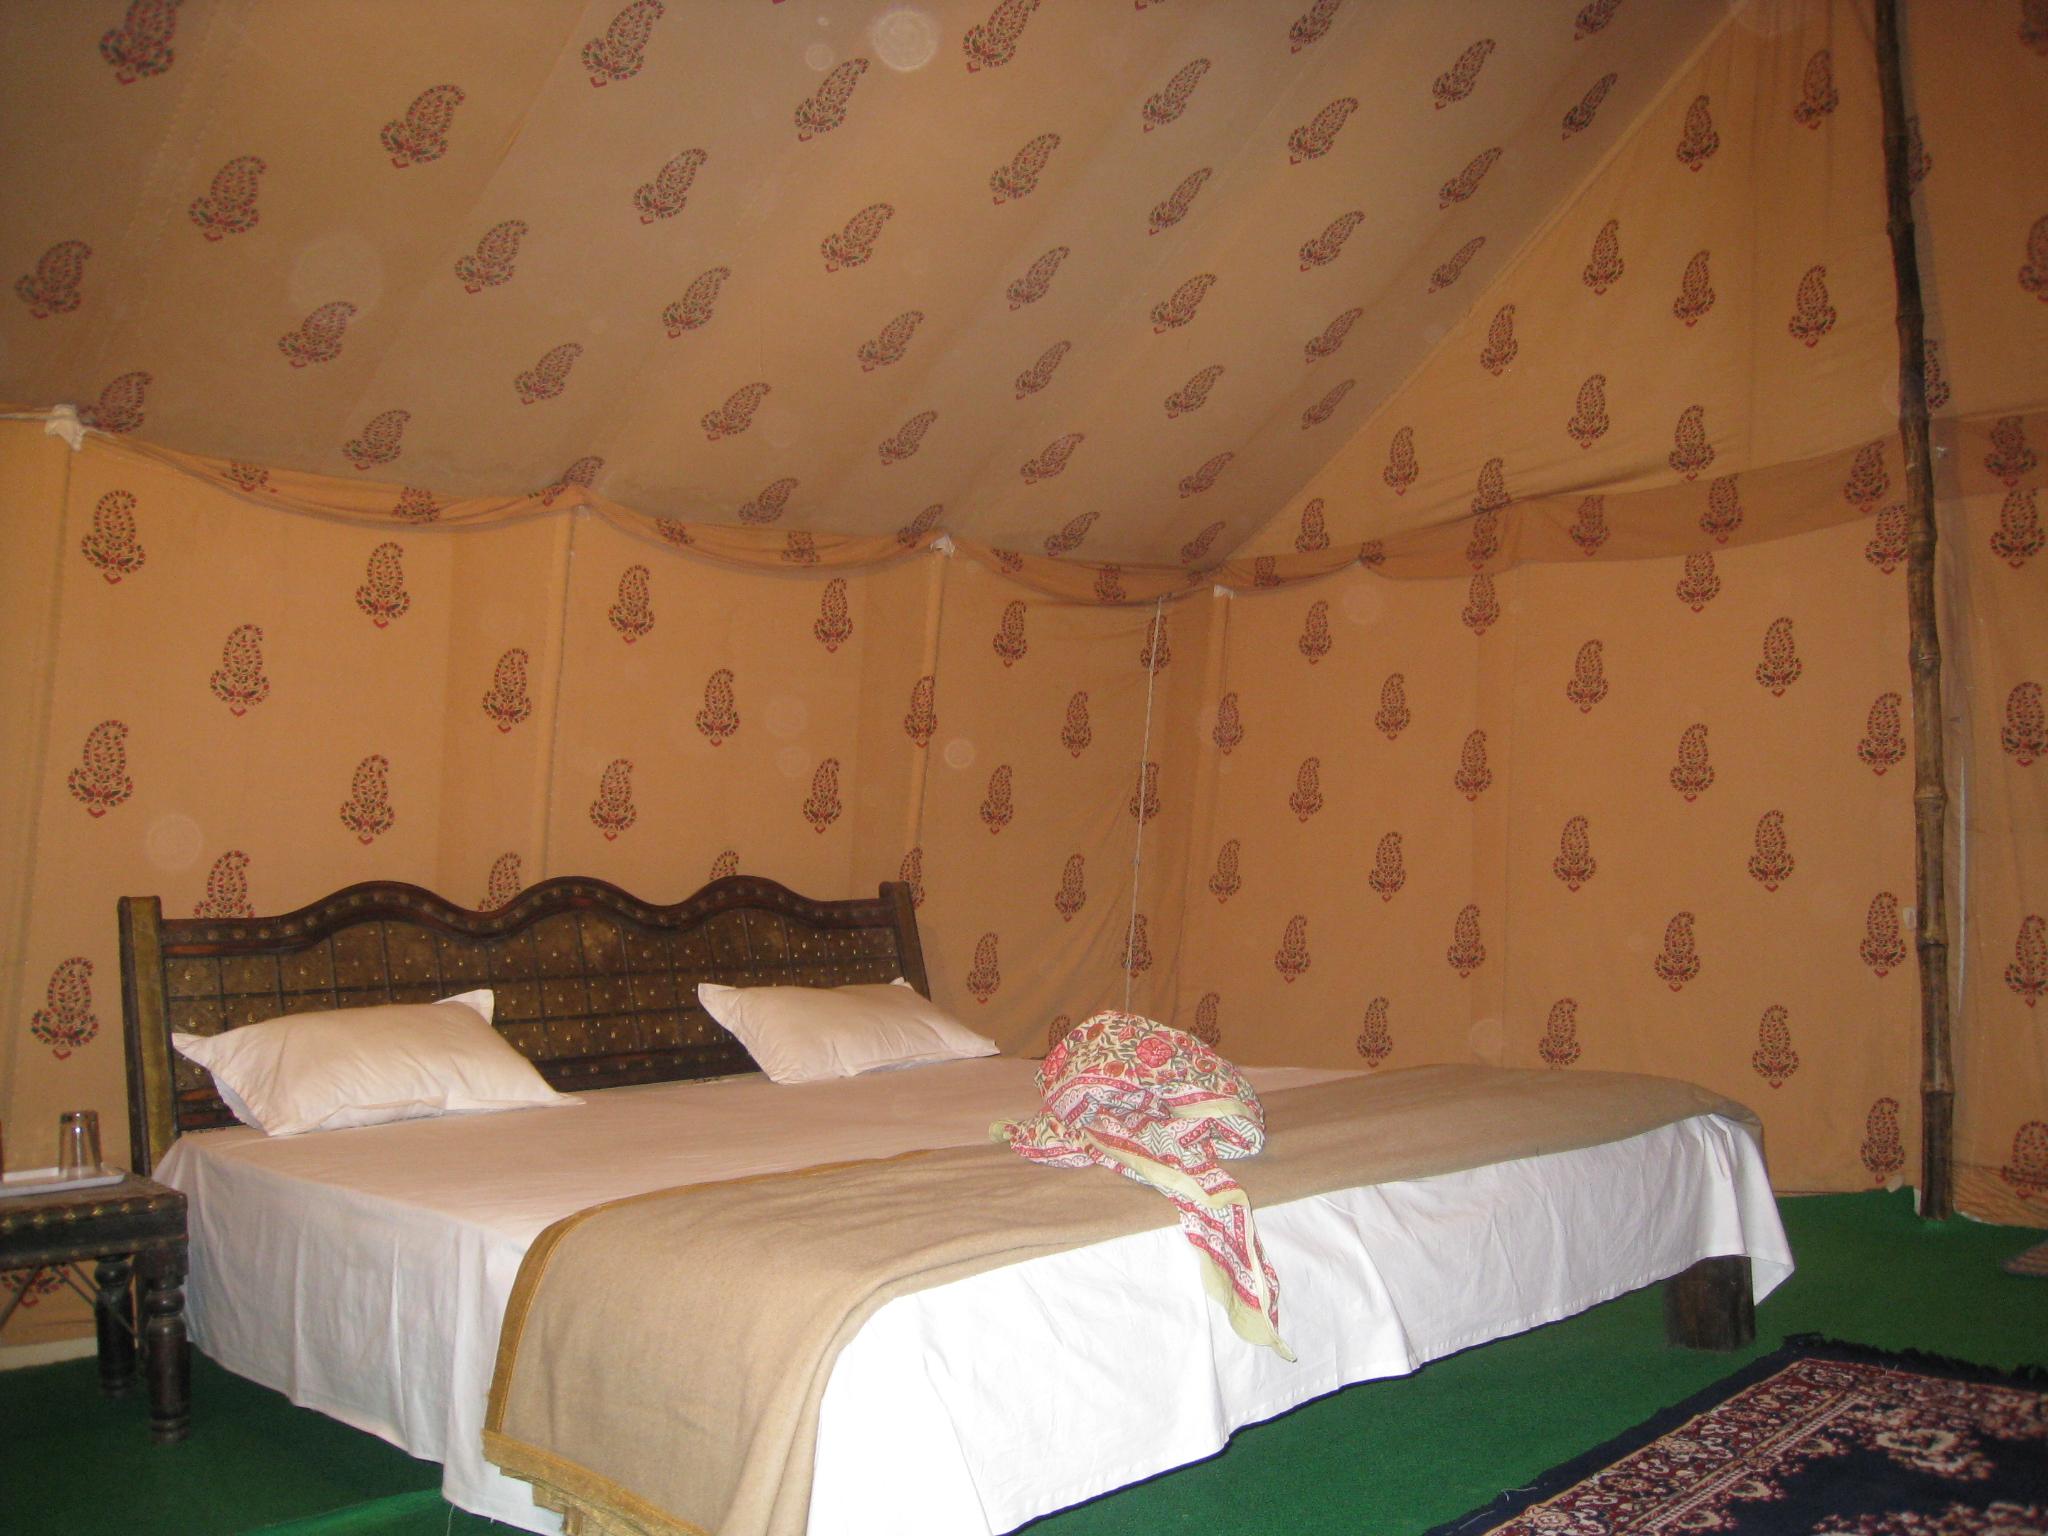 Swiss tent safari package,                                     SHAHI PALACE HOTEL JAISALMER - Budget Hotels in Jaisalmer